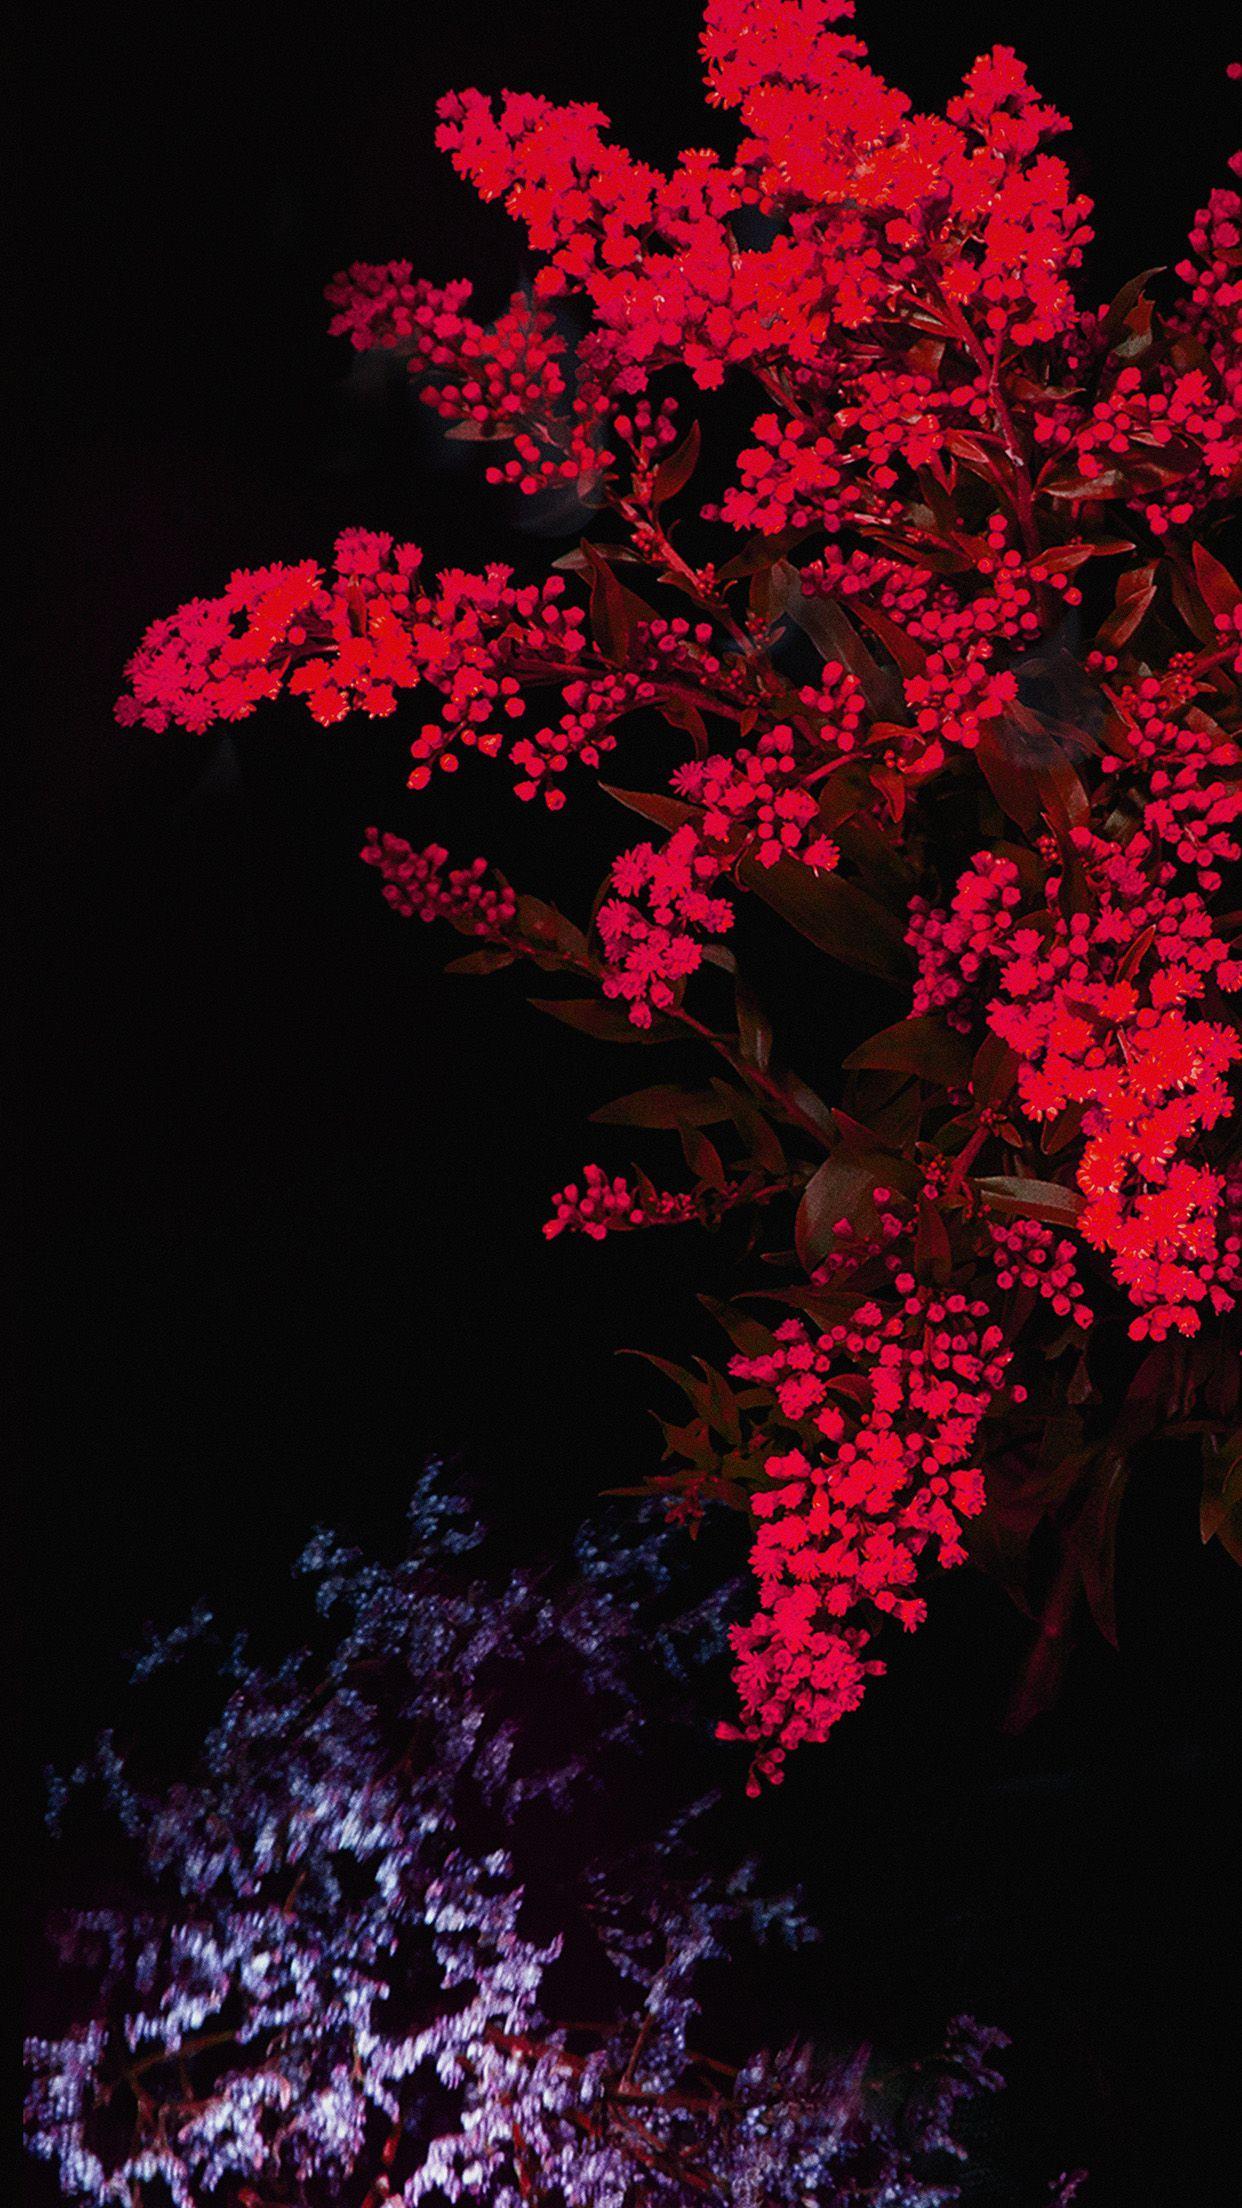 Dark Red Flower Wallpapers Top Free Dark Red Flower Backgrounds Wallpaperaccess